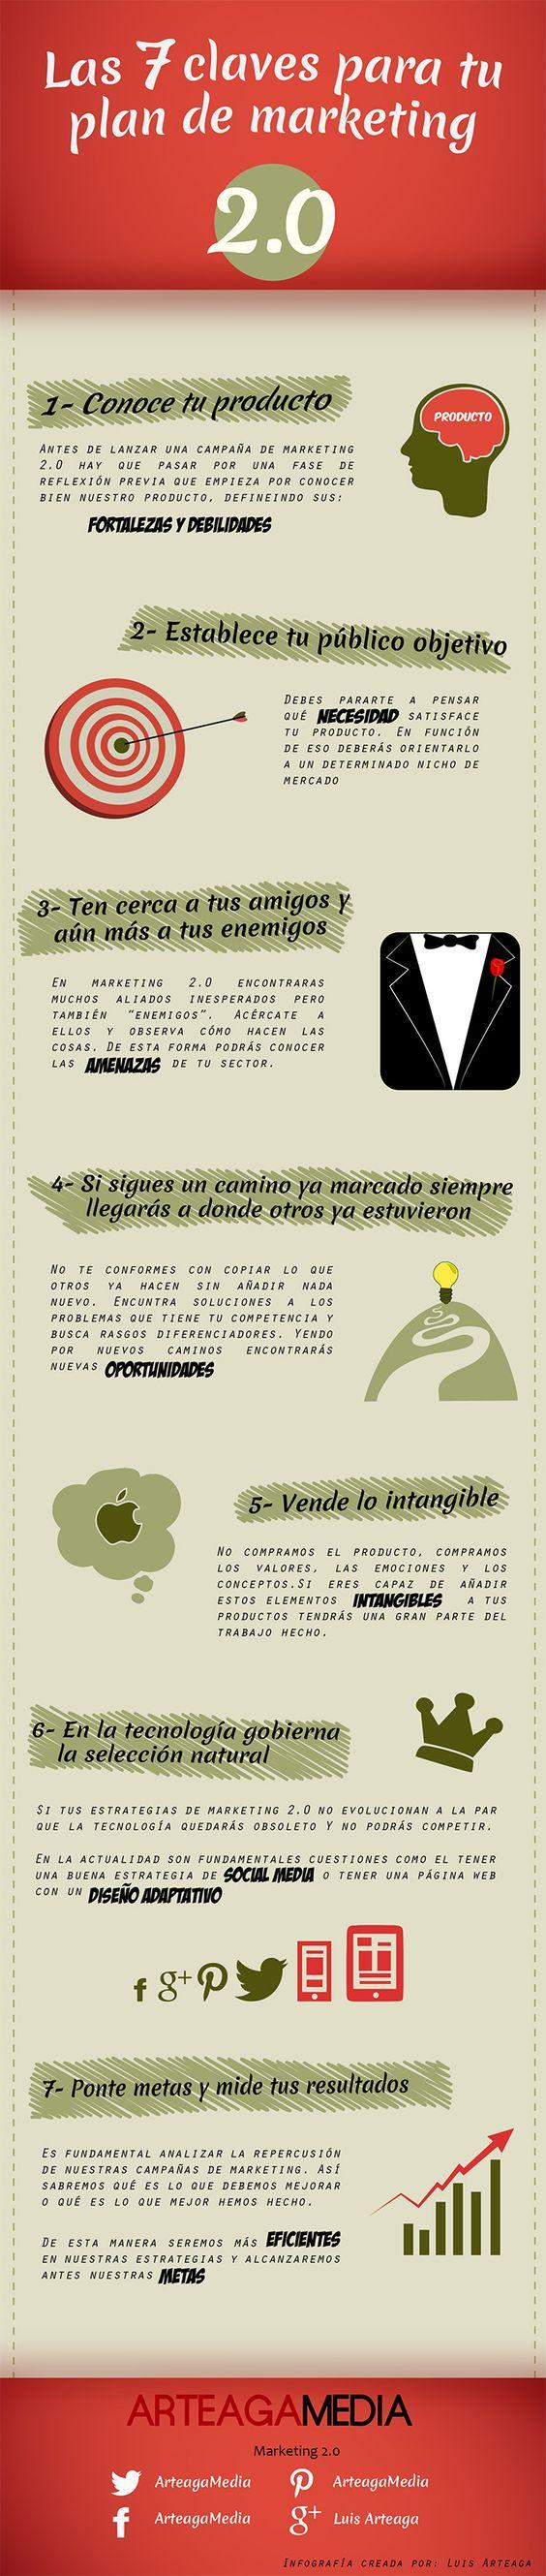 7 claves para tu plan de marketing 2.0 #infografia en español